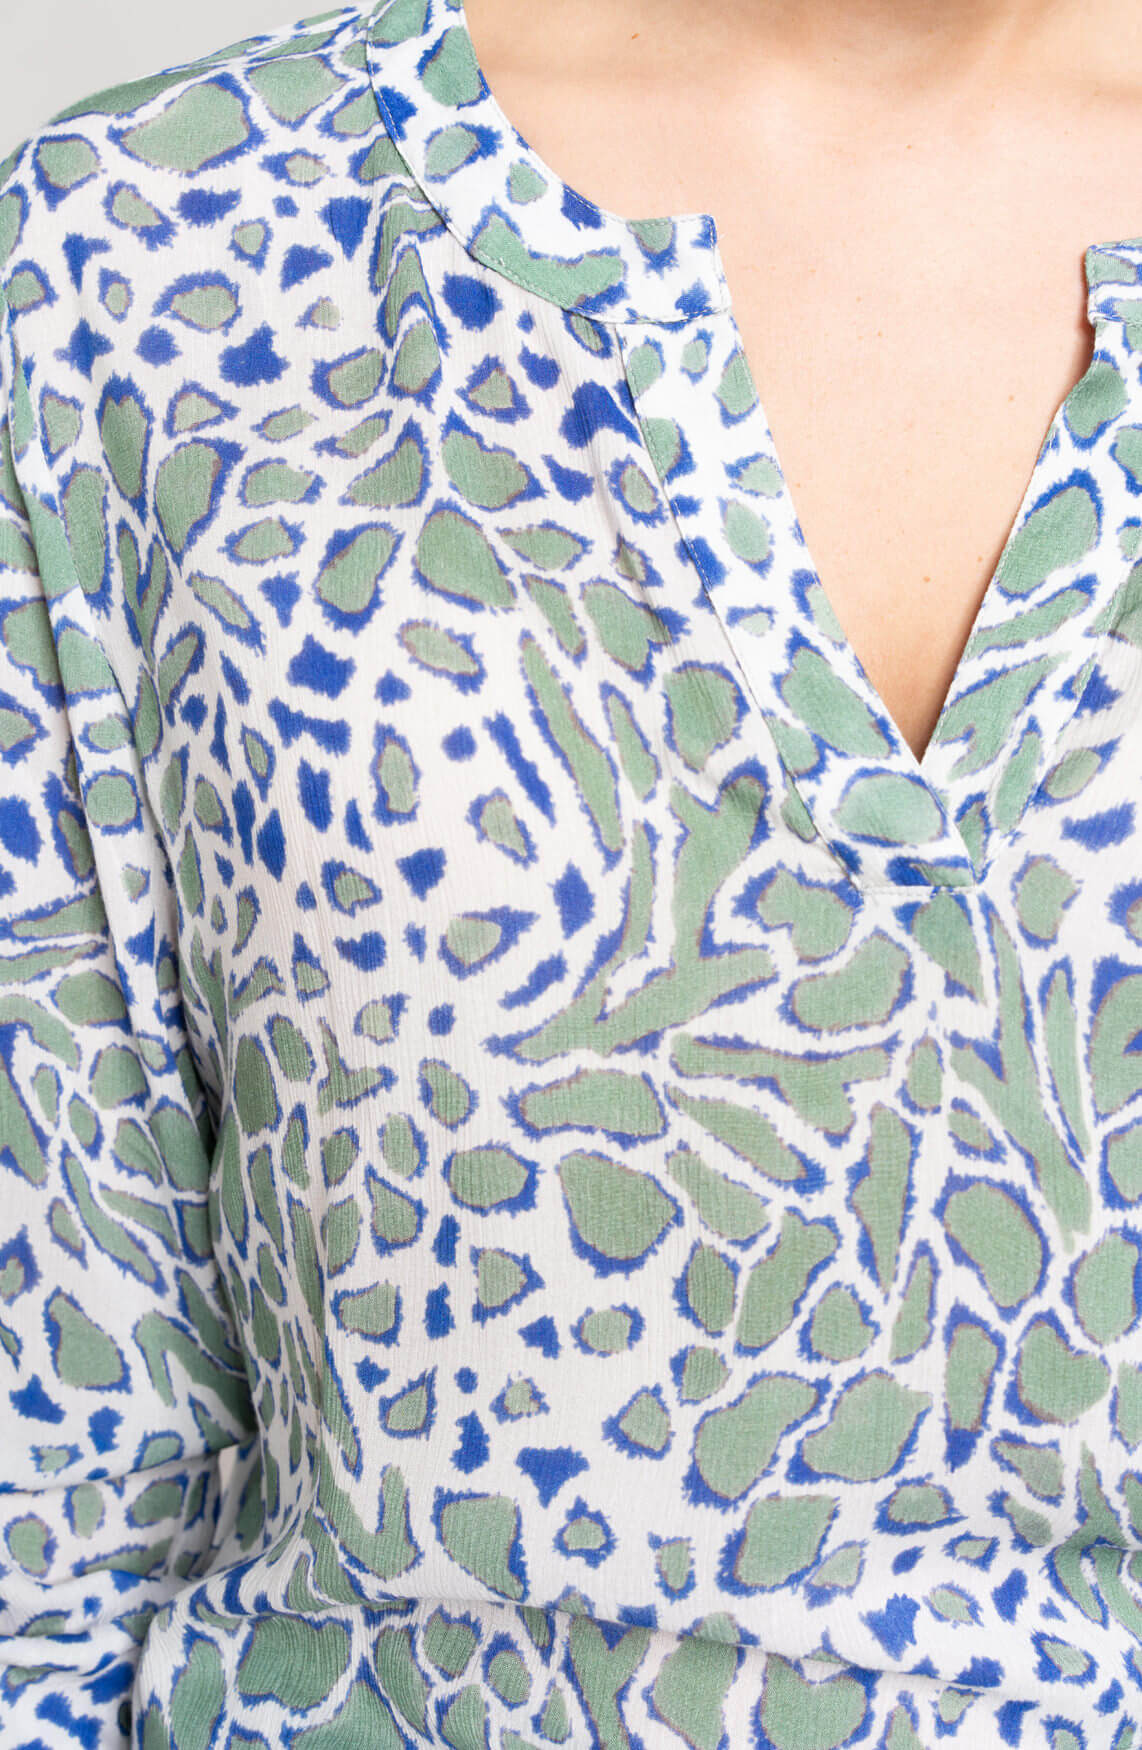 Anna Blue Dames Blouse met print groen